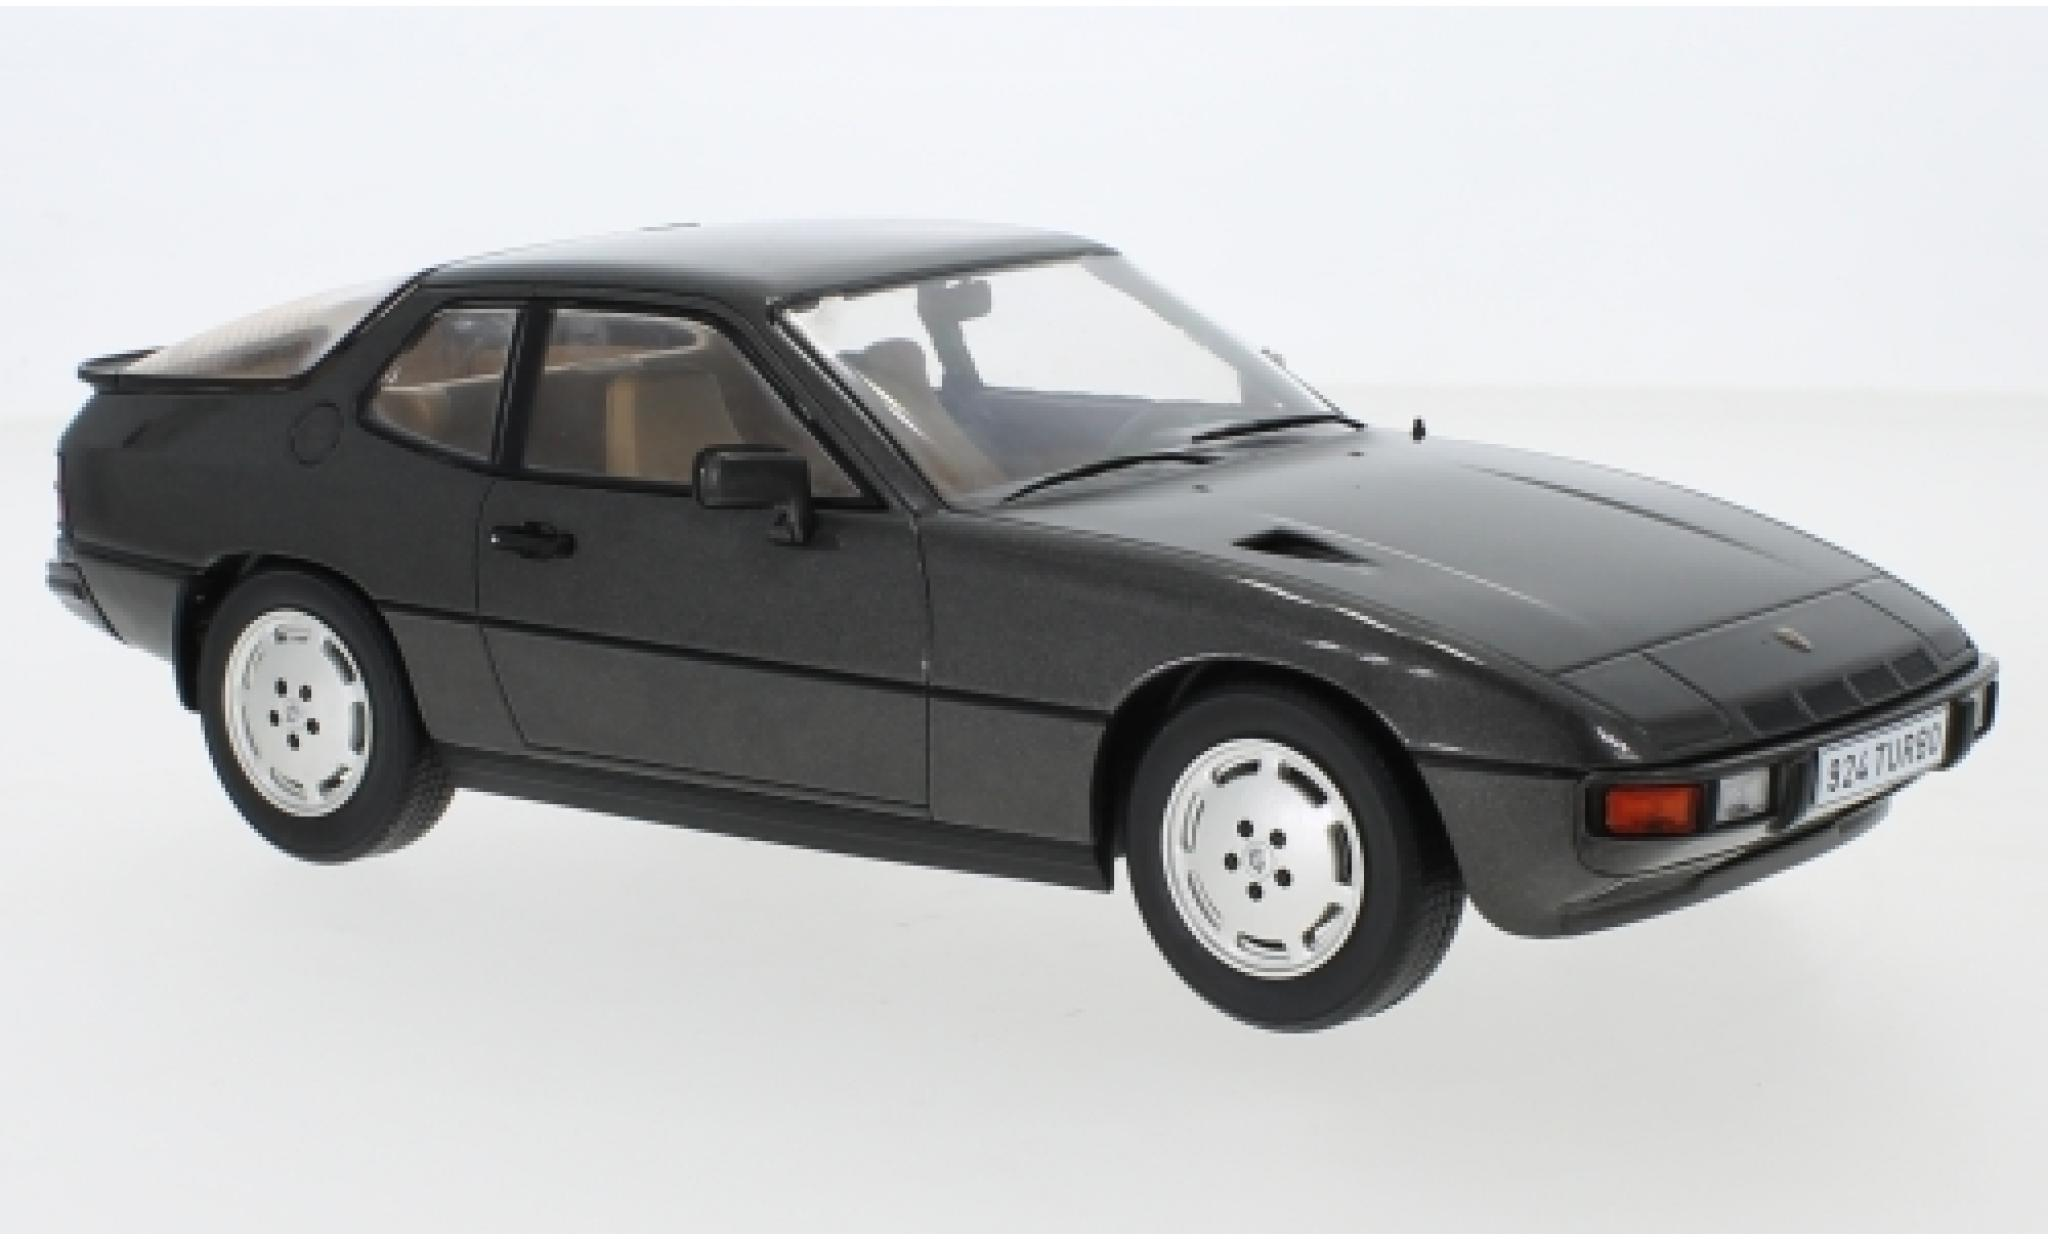 Porsche 924 1/18 MCG Turbo metallise grey 1979